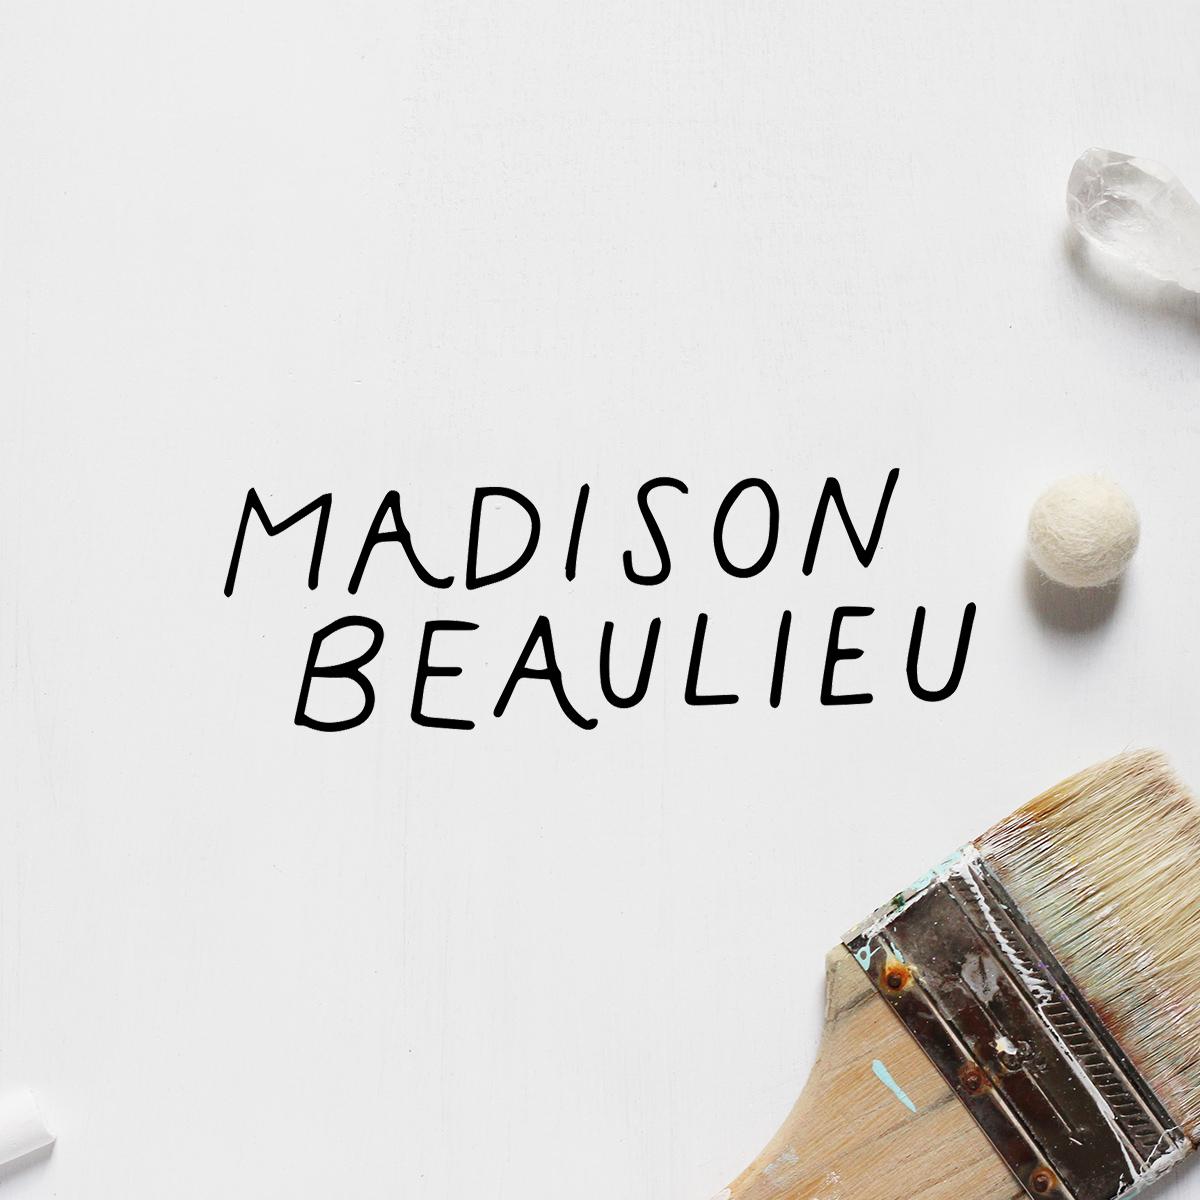 mads-beaulieu-case-study